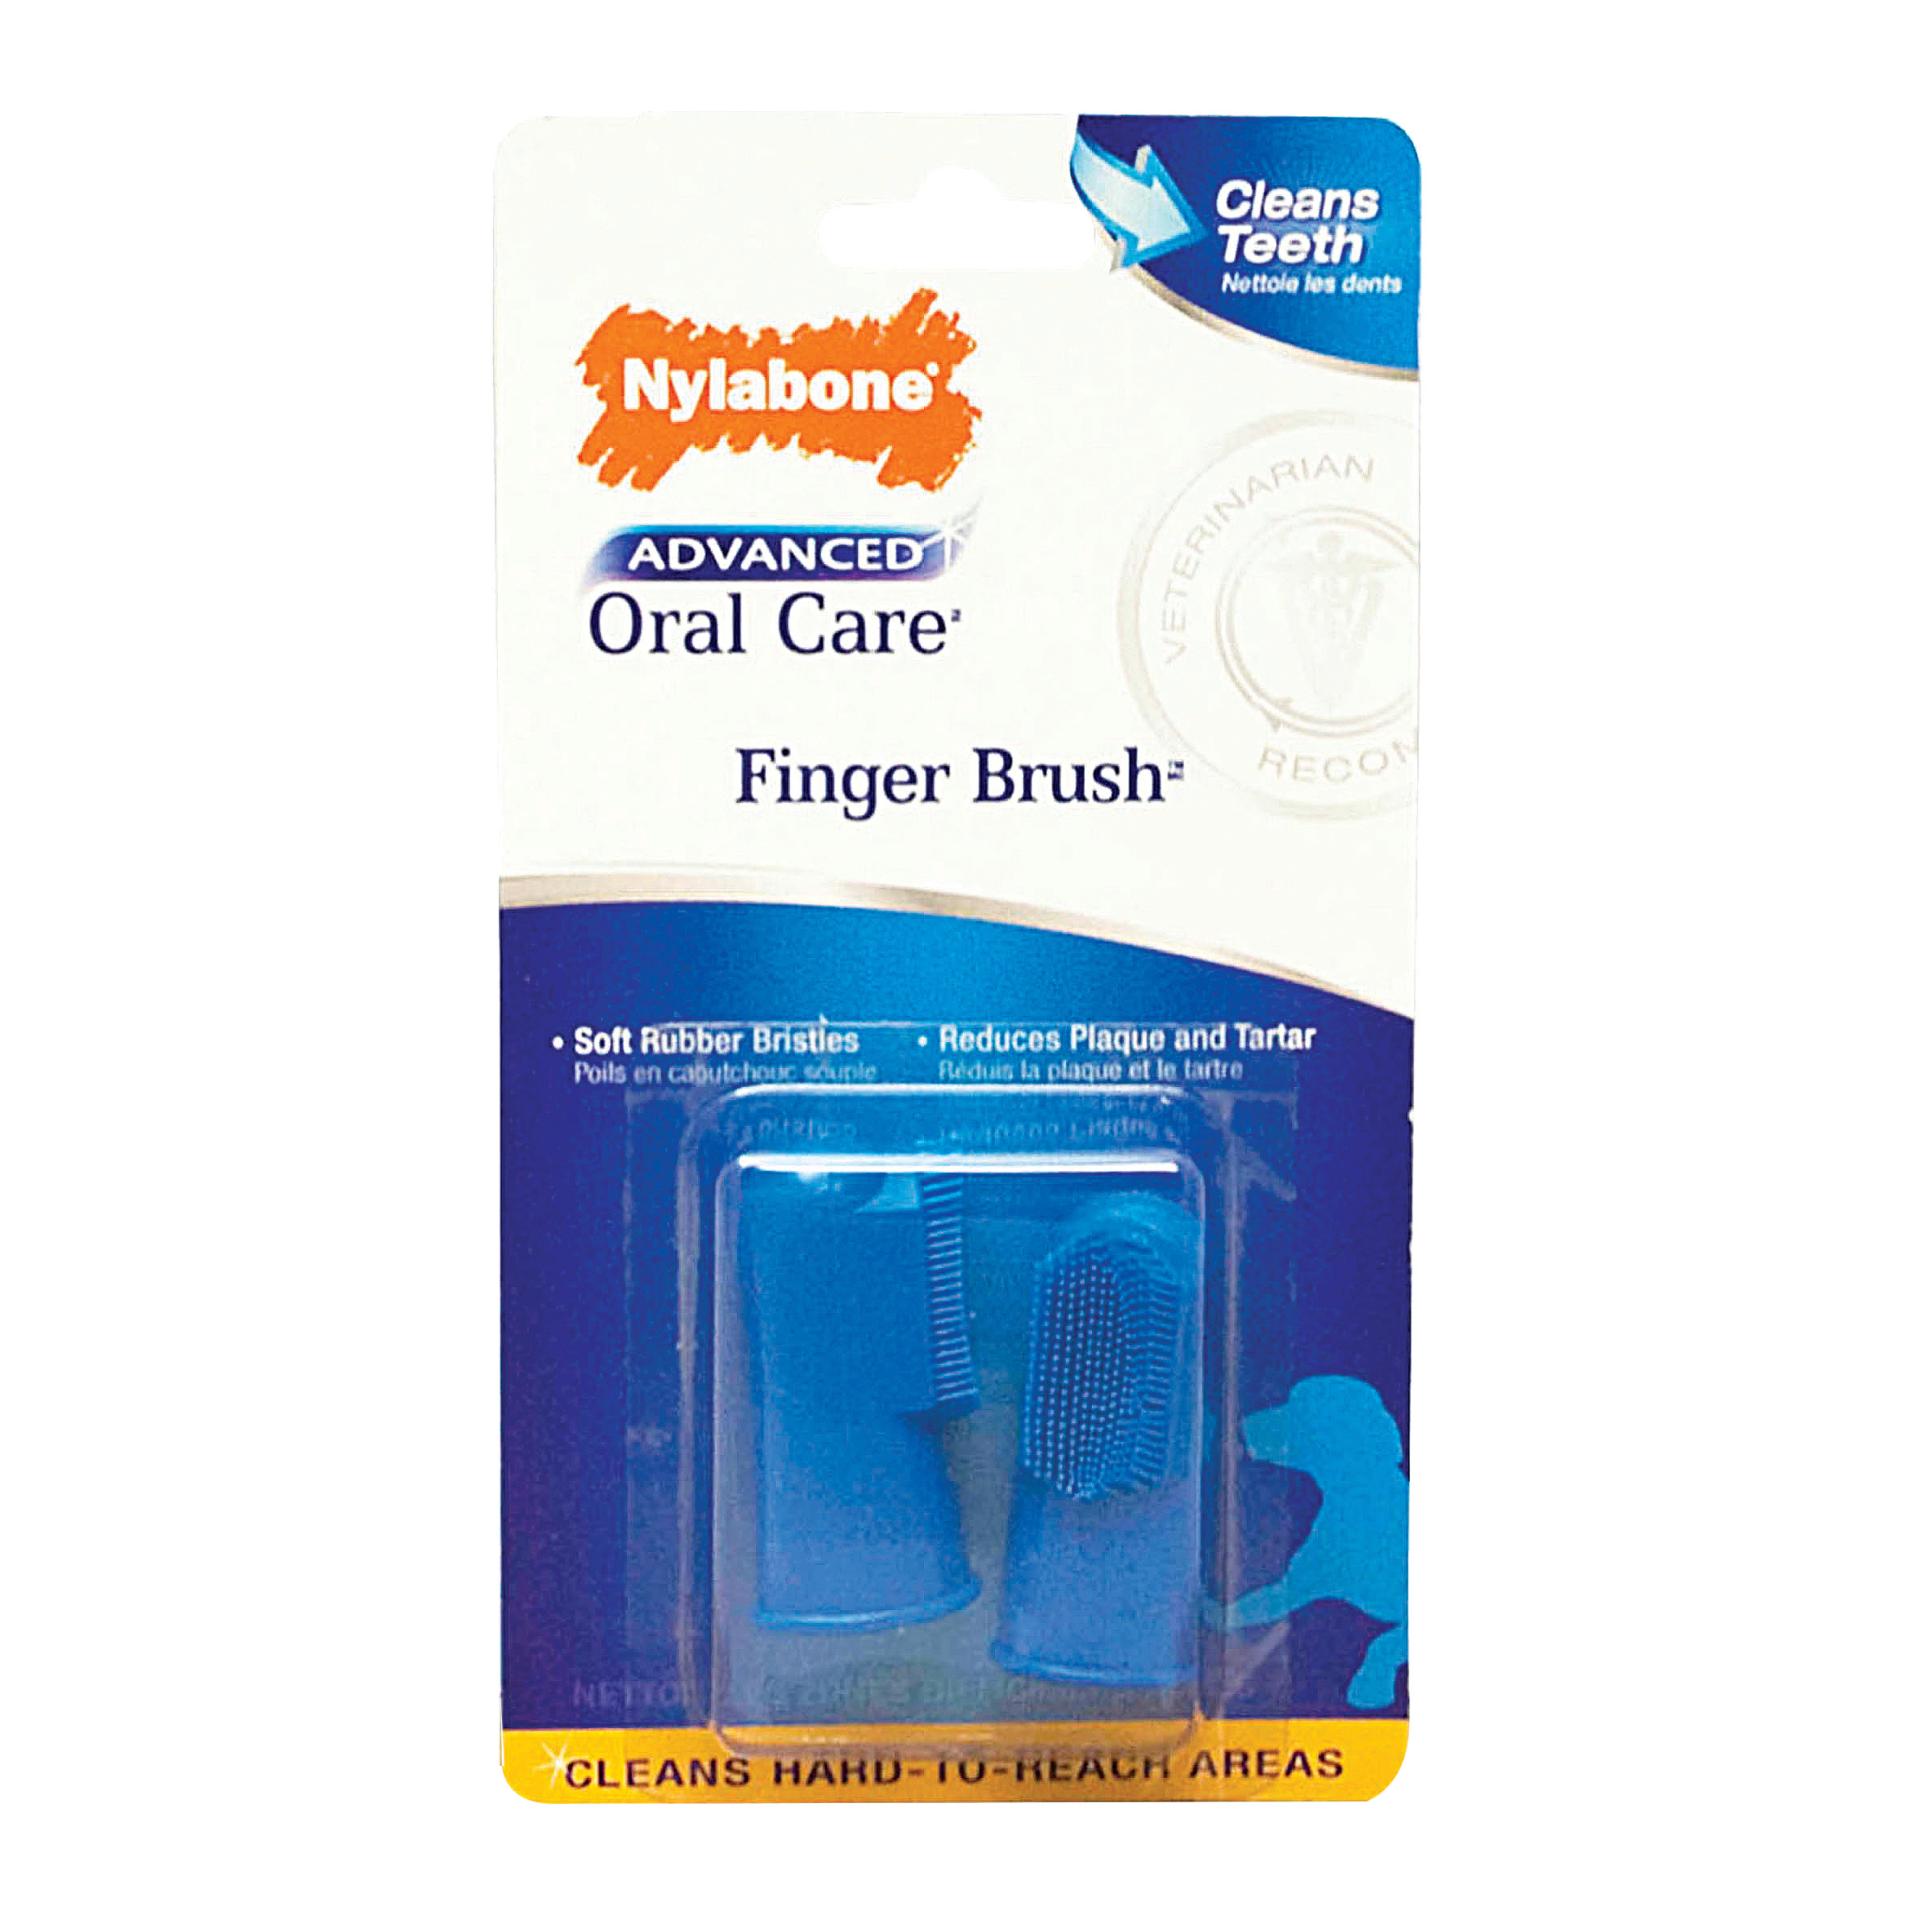 Nylabone Nylabone Advanced Oral Finger Brush 2 Count Product Image